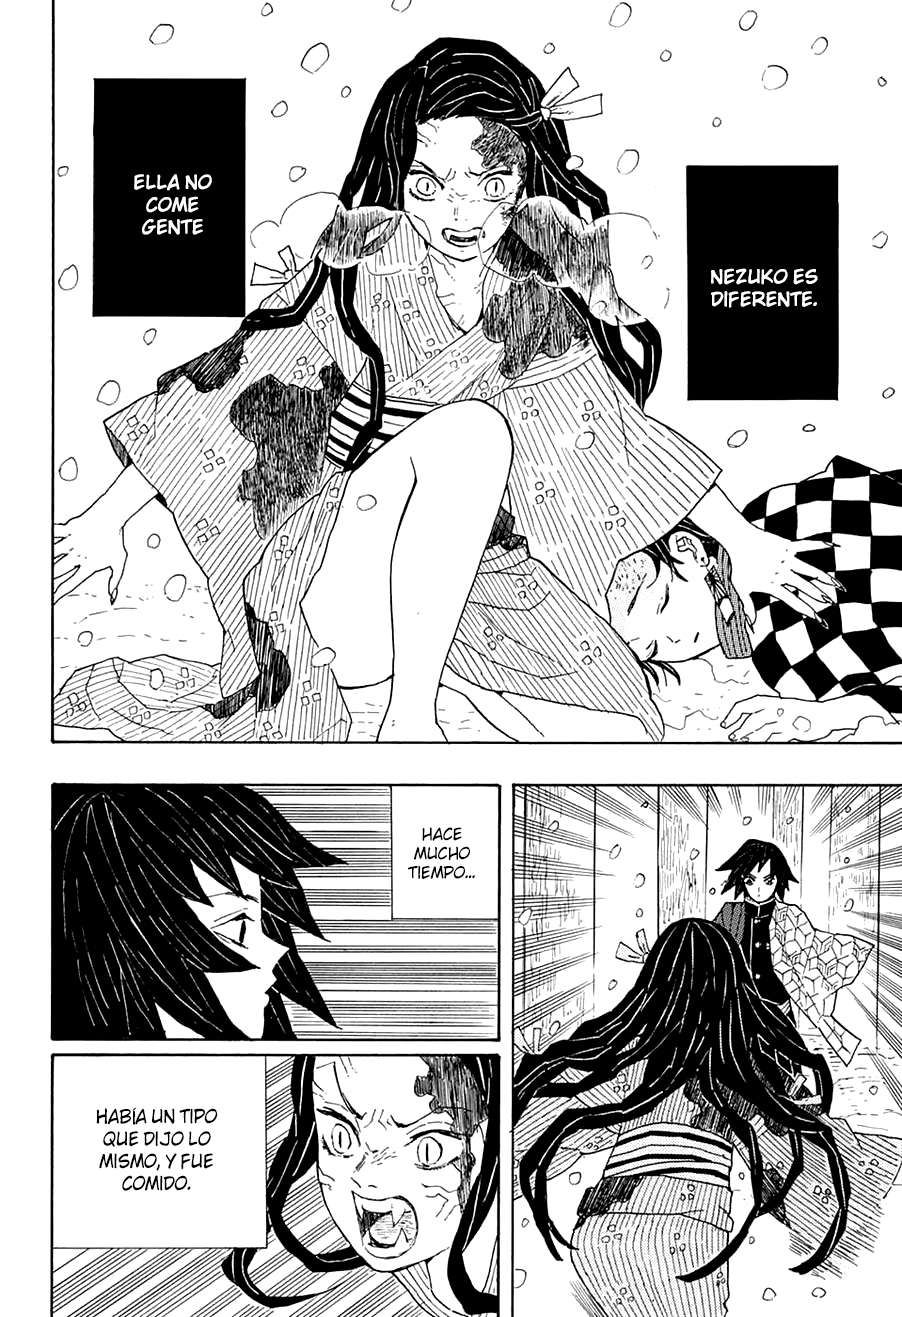 Pagina 47 Manga 1 Kimetsu No Yaiba Demon Slayer Anime Wall Art Manga Illustration Haikyuu Manga